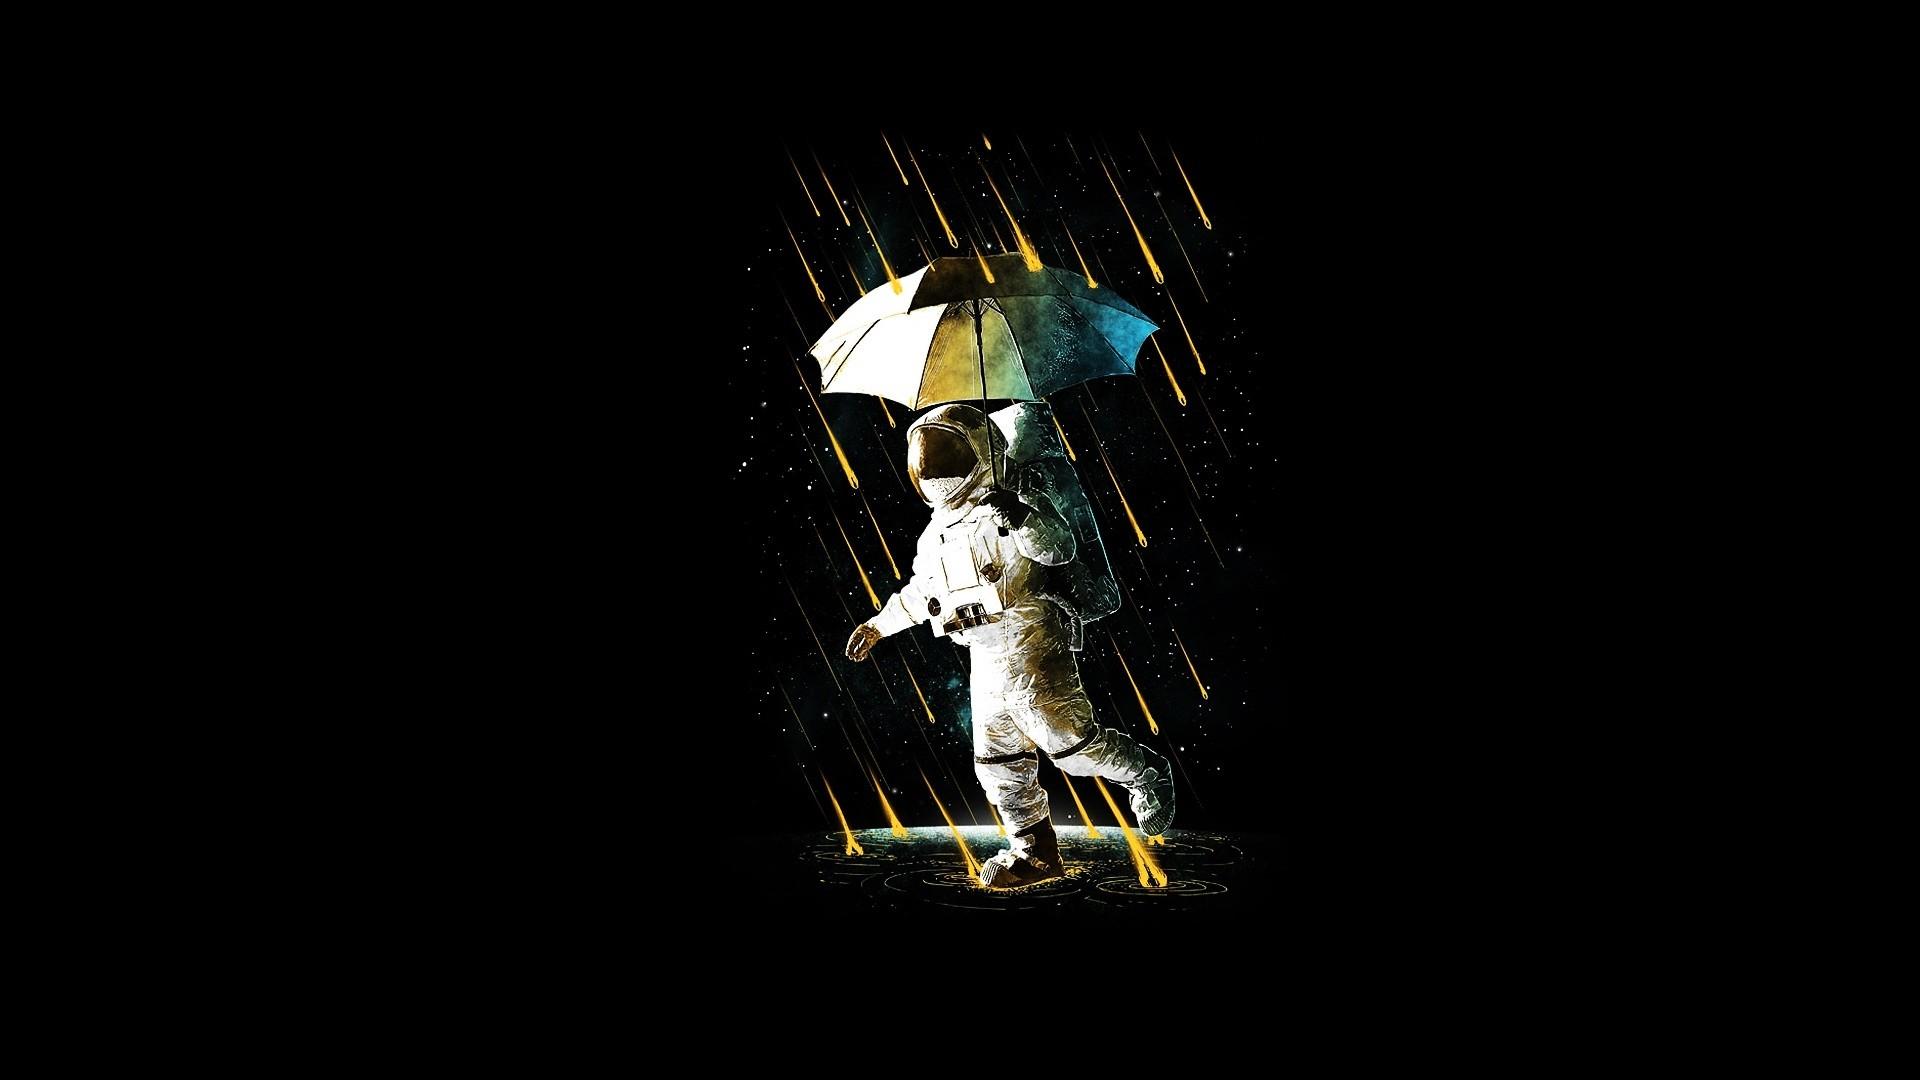 Rain Minimalist wallpaper for pc